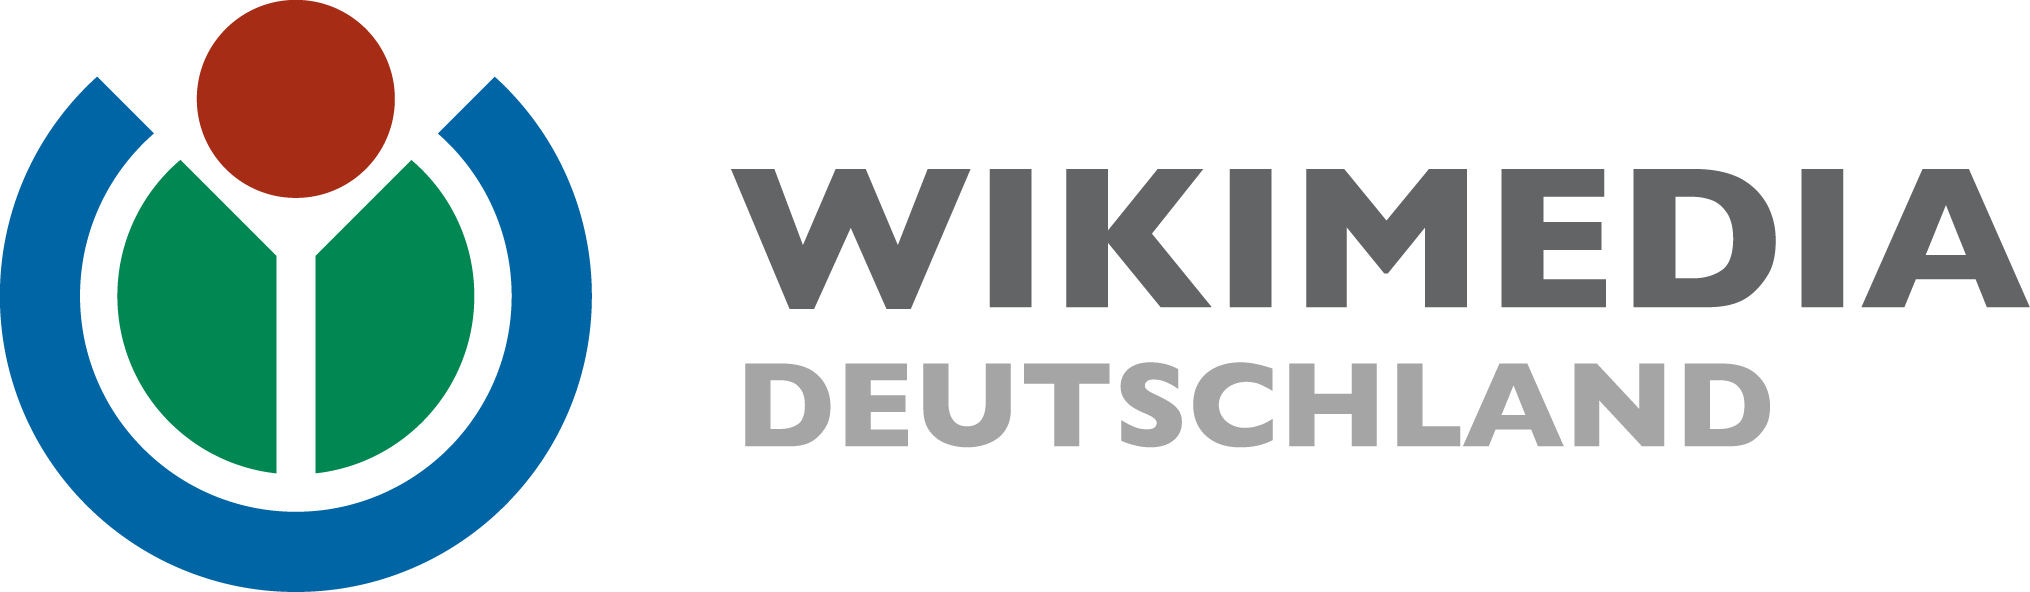 Wikimediadeutschland-logo.png